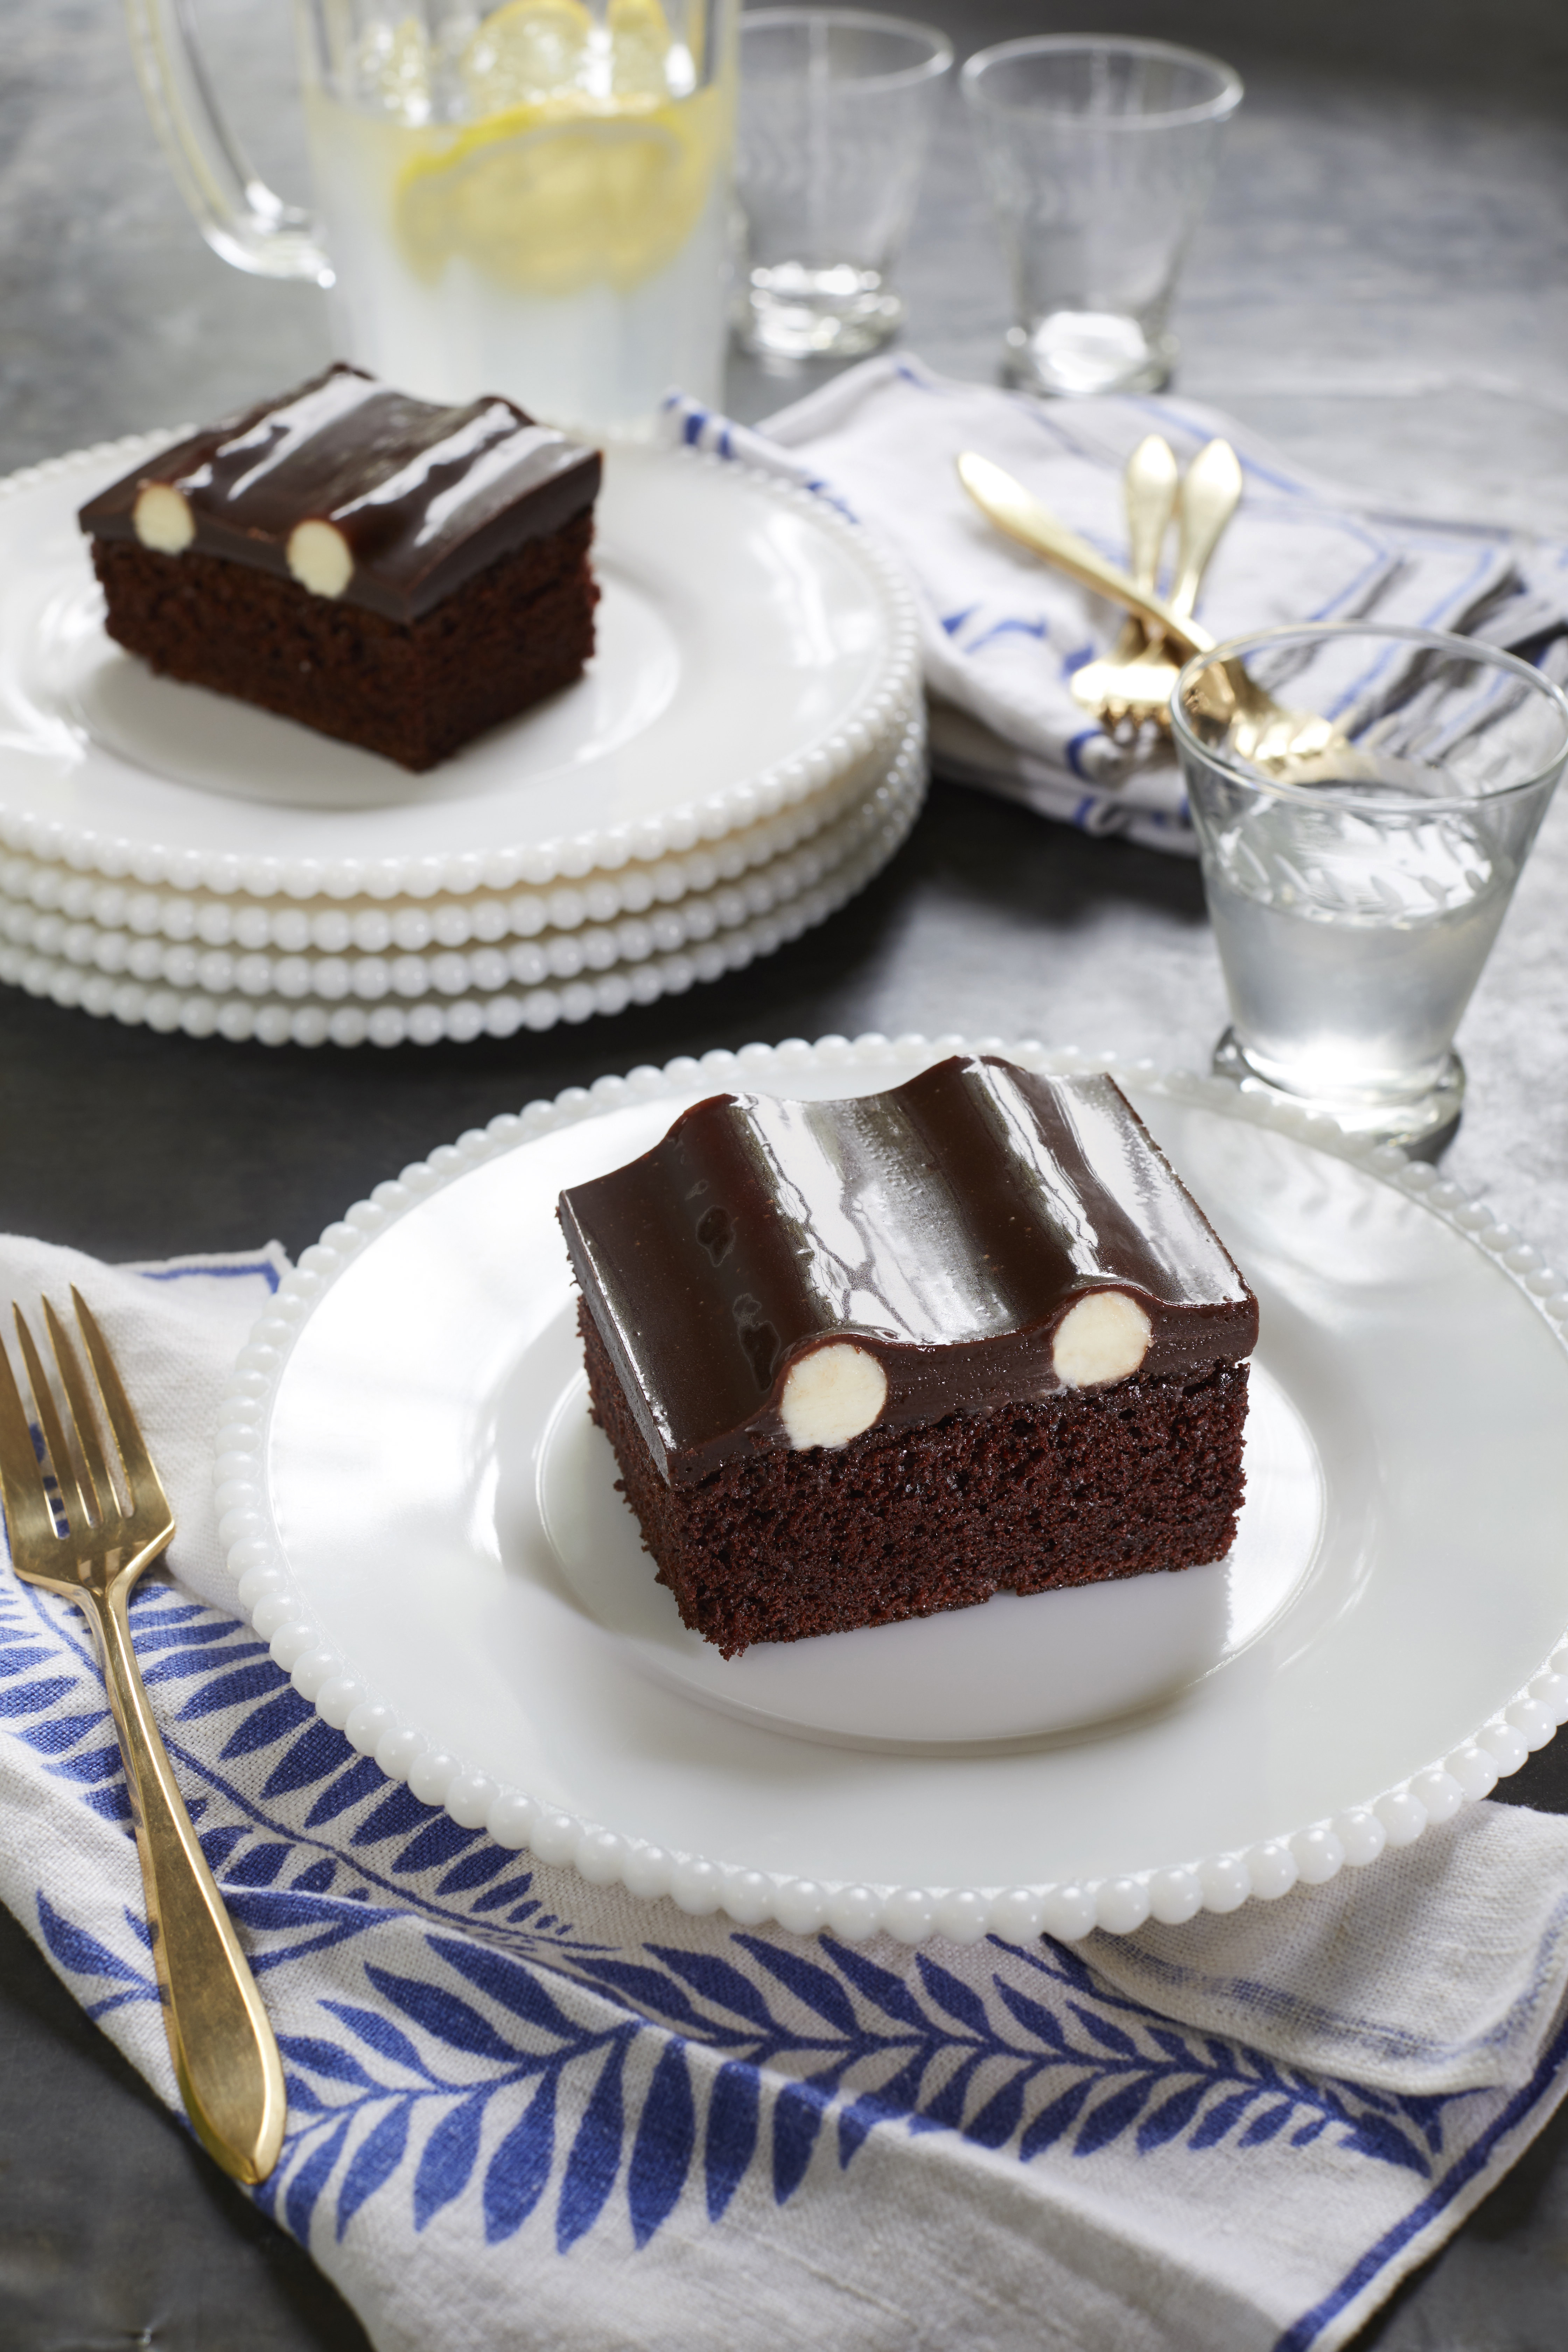 Chocolate Bumpy Cake